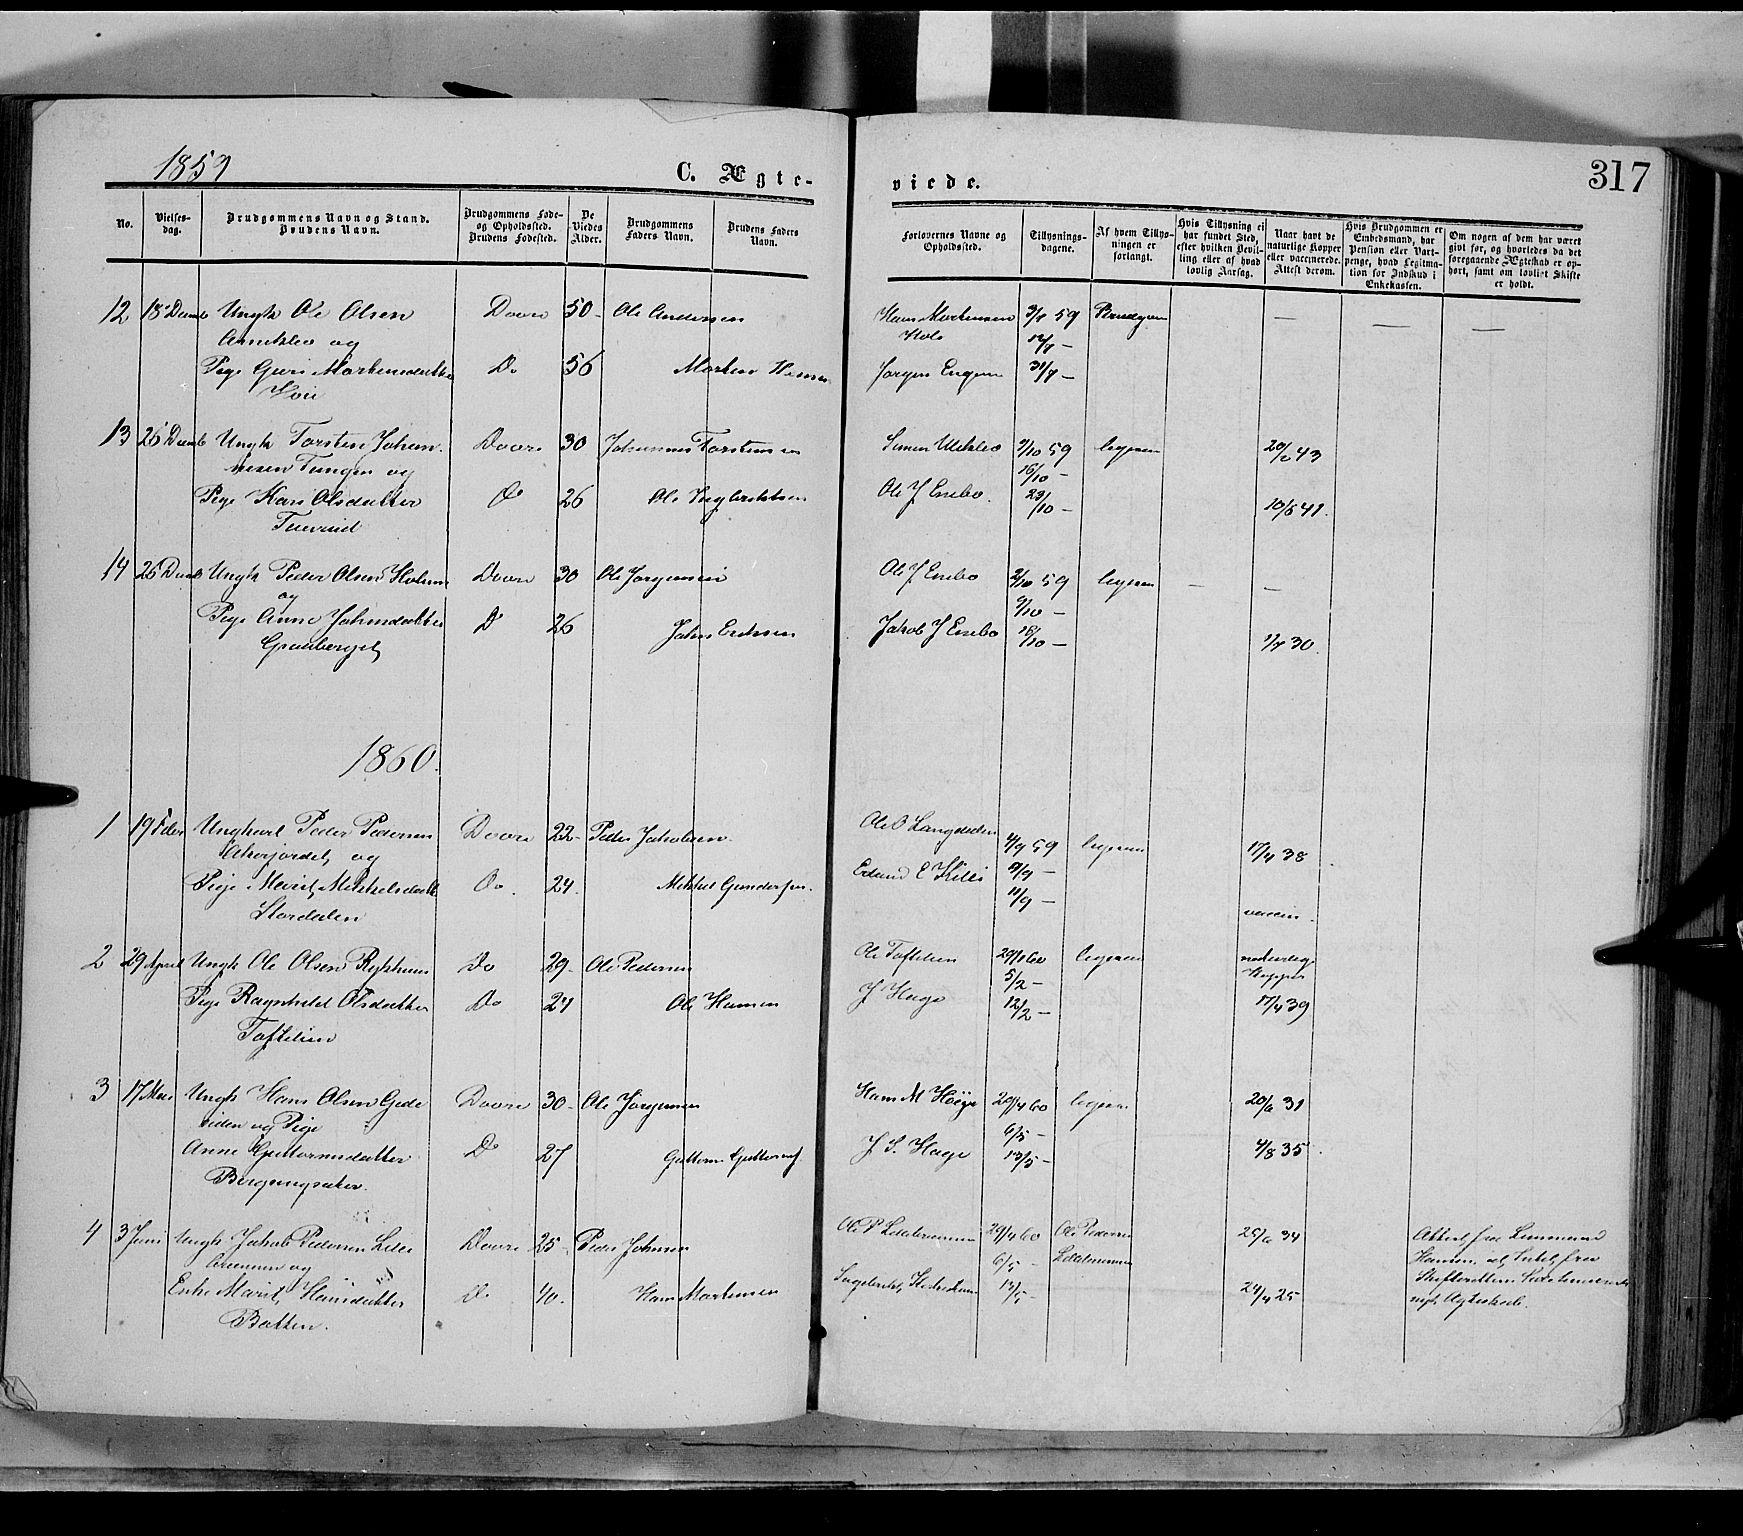 SAH, Dovre prestekontor, Parish register (official) no. 1, 1854-1878, p. 317